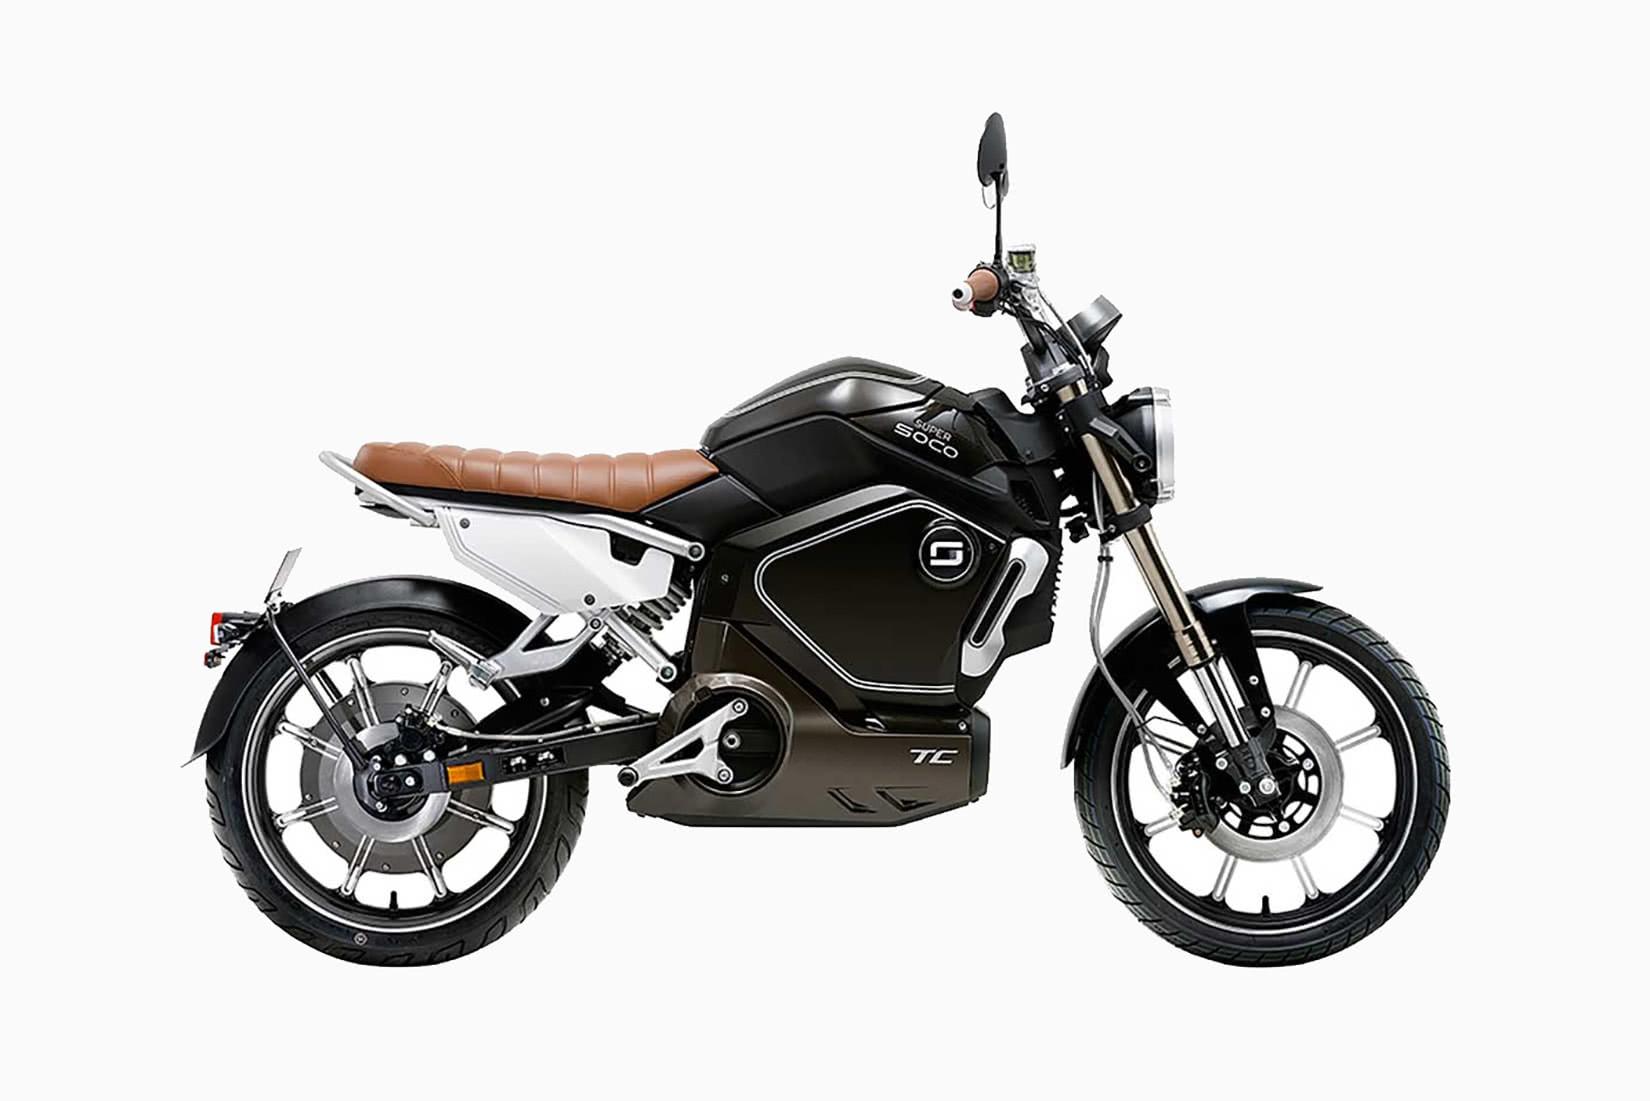 best electric motorcycles 2021 luxury Super Soco TC - Luxe Digital